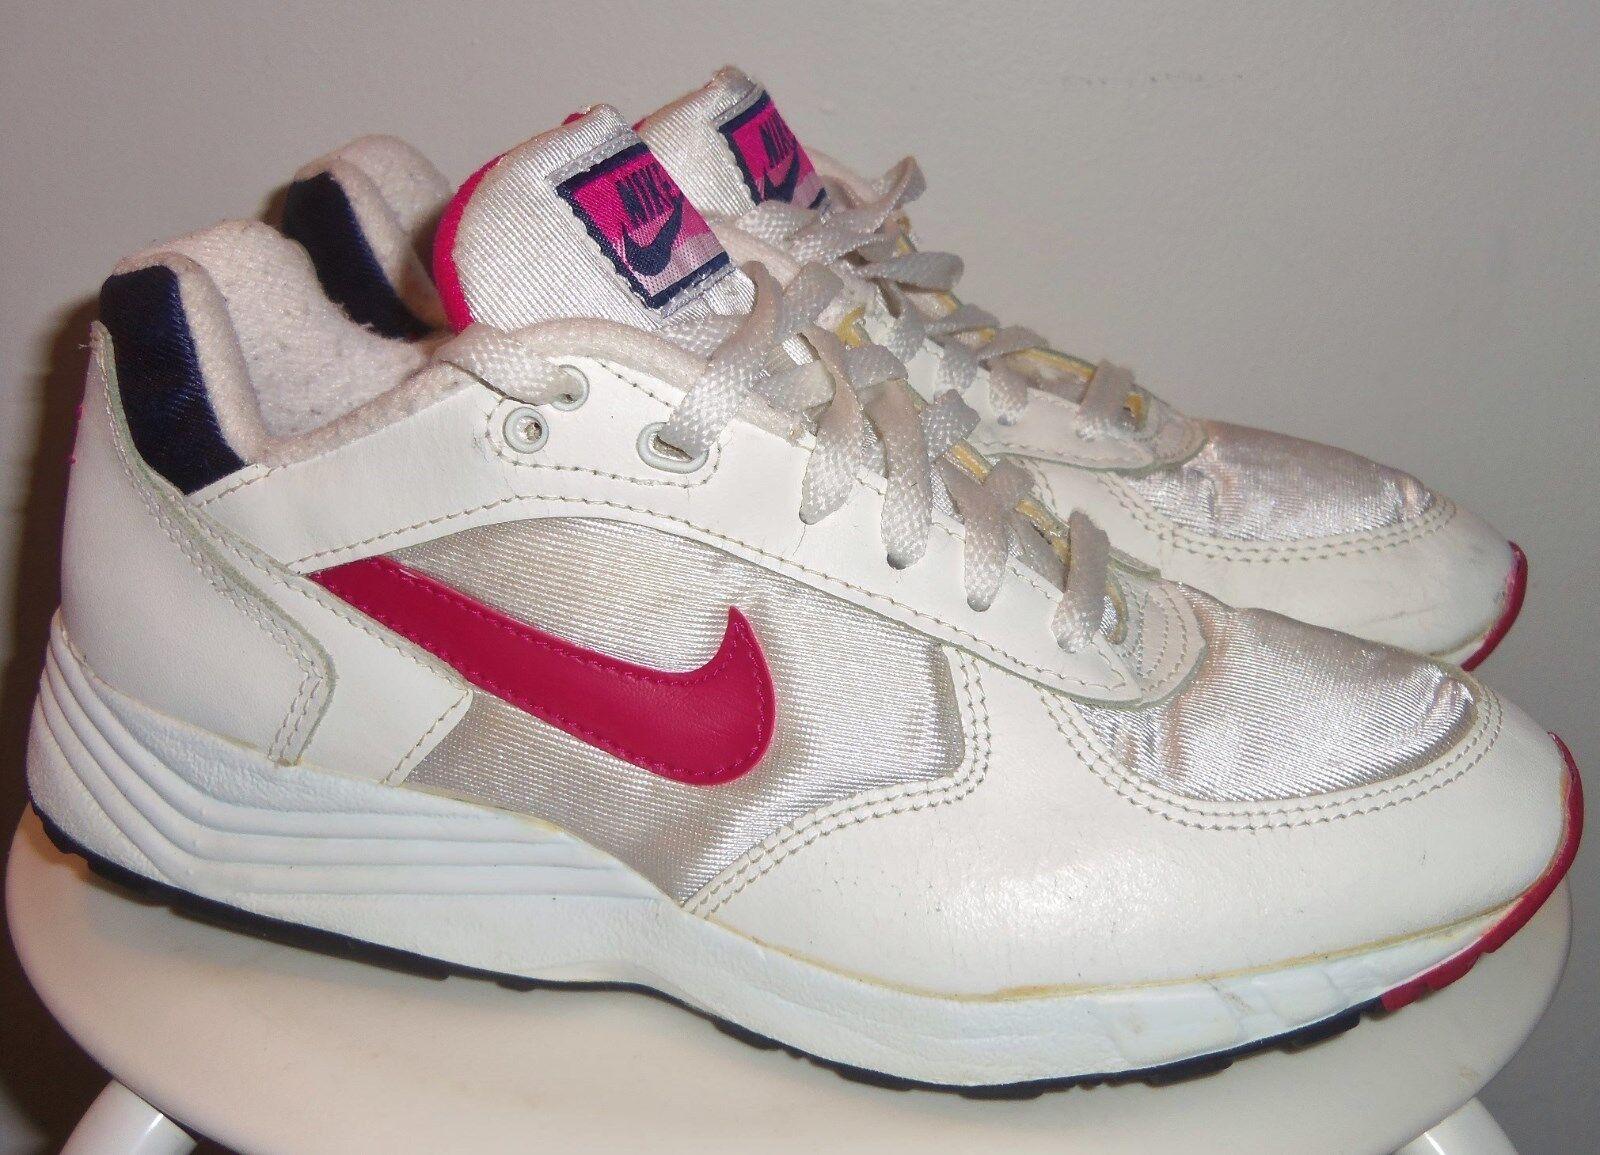 VINTAGE 1993 NIKE OG WMNS (WHITE  MAGENTA  NAVY) RUNNING SHOES 9 (CLEAN) 90's